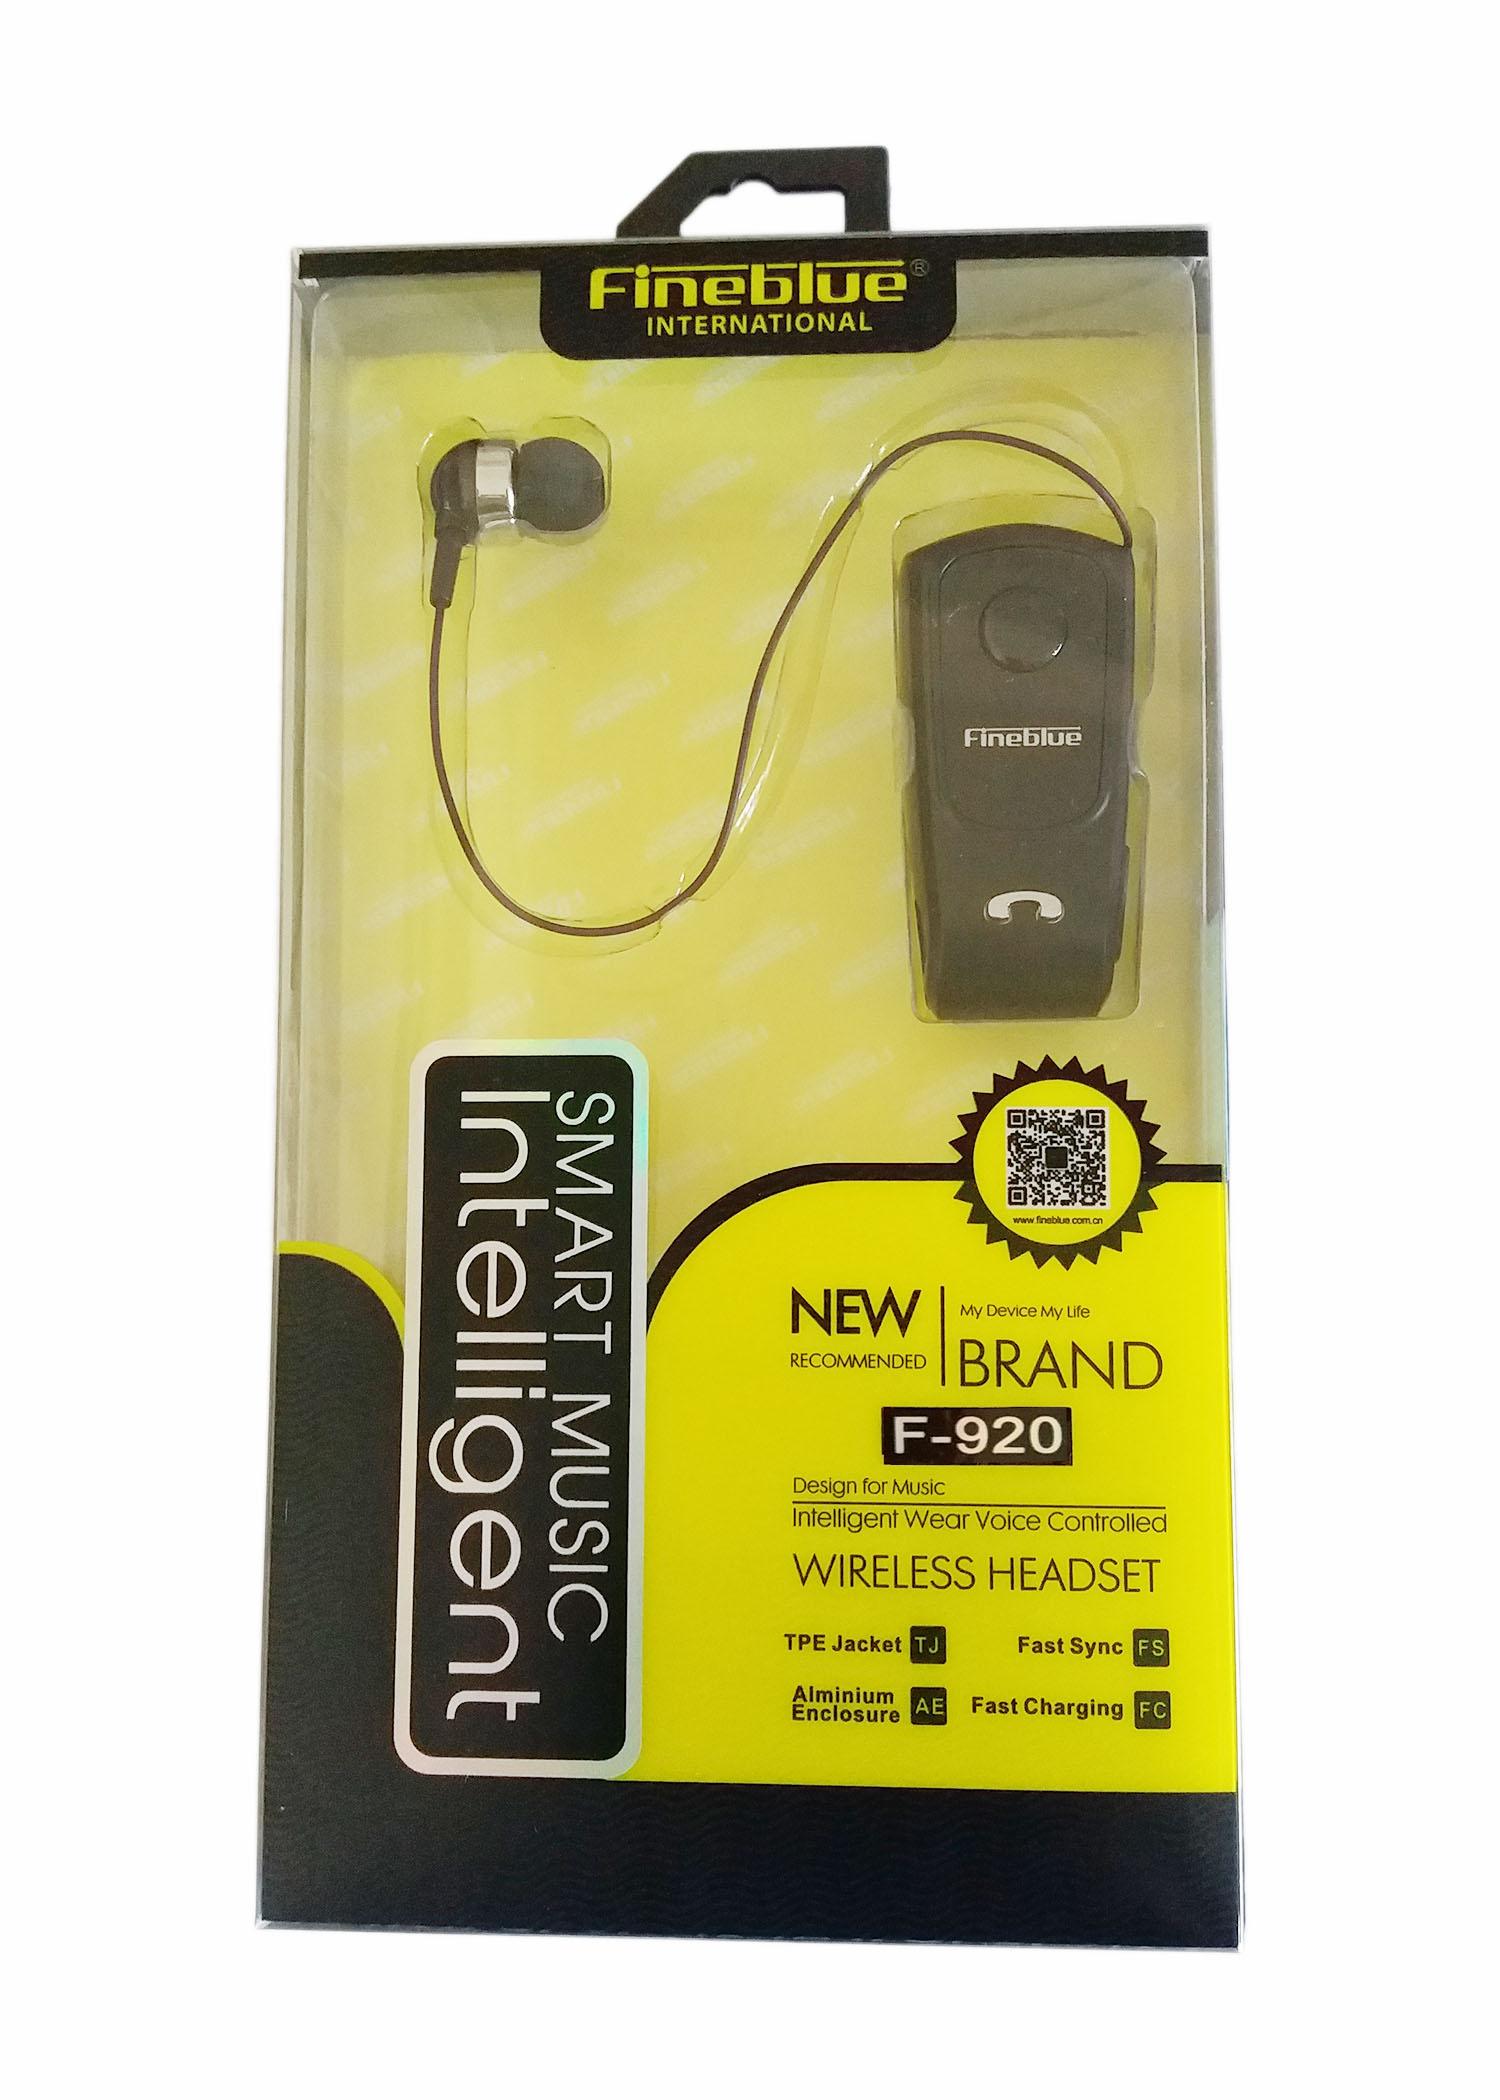 FineBlue F920 Mini Bluetooth Headset Remind Vibration Wear Clip Sports Running Earphone for Phone new fineblue f960 wireless driver bluetooth earphone headset calls remind vibration wear clip sports running headphone for phone